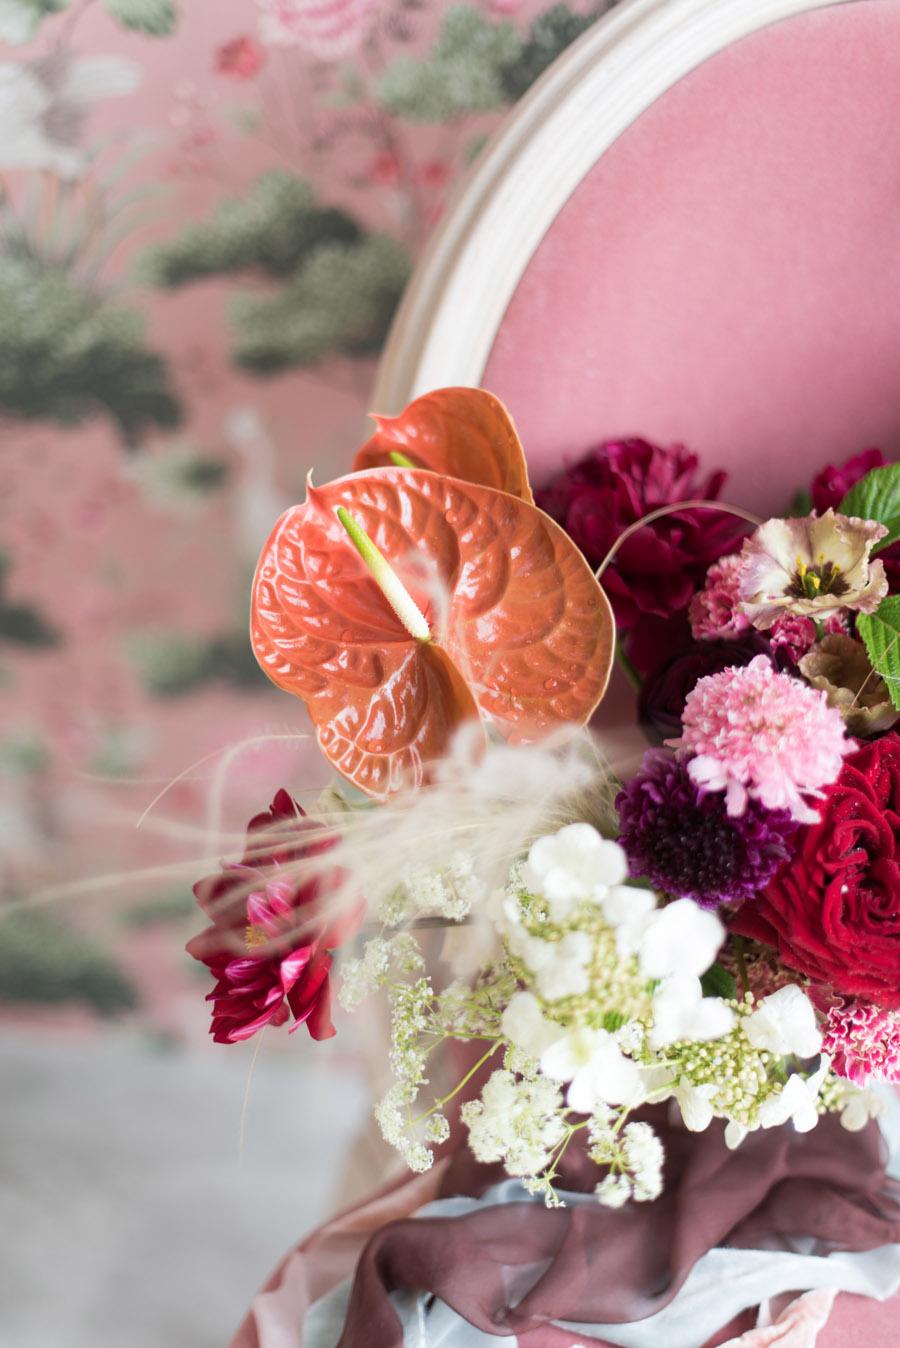 floral wedding ideas at Millbridge Court on English Wedding - photo credit Julie Michaelsen Photography (19)